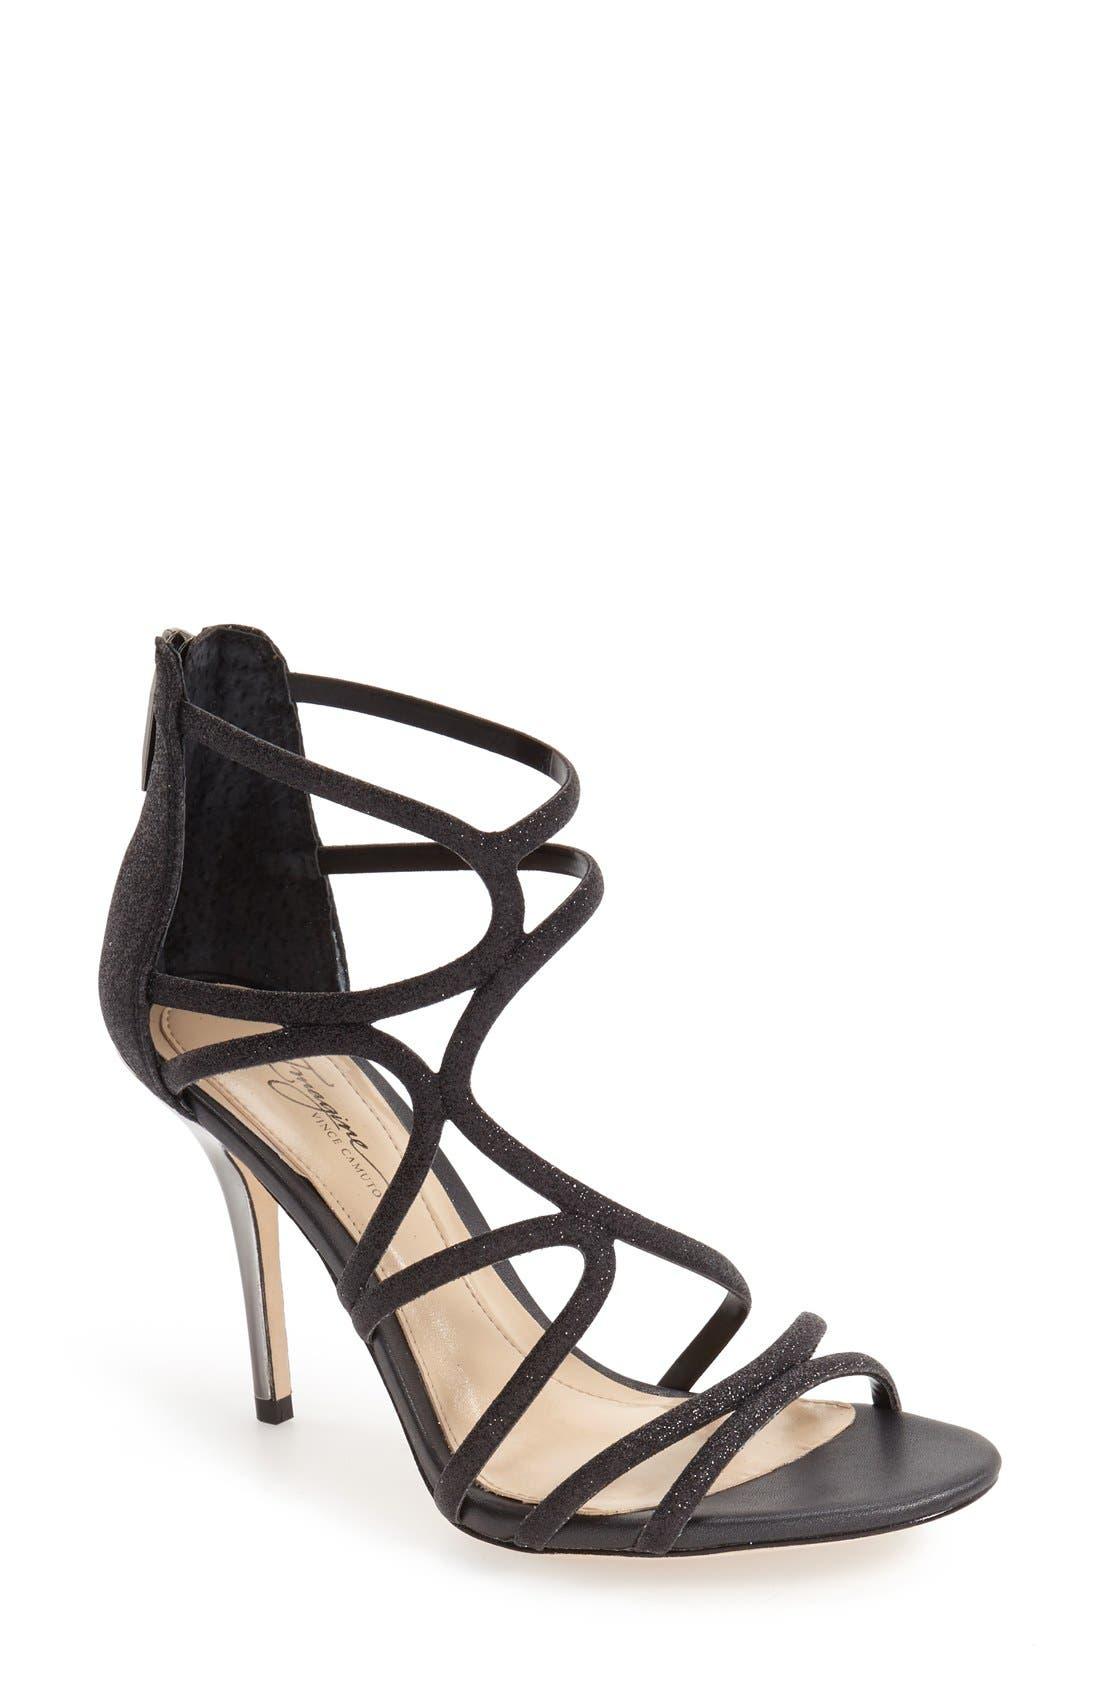 'Ranee' Dress Sandal,                             Main thumbnail 1, color,